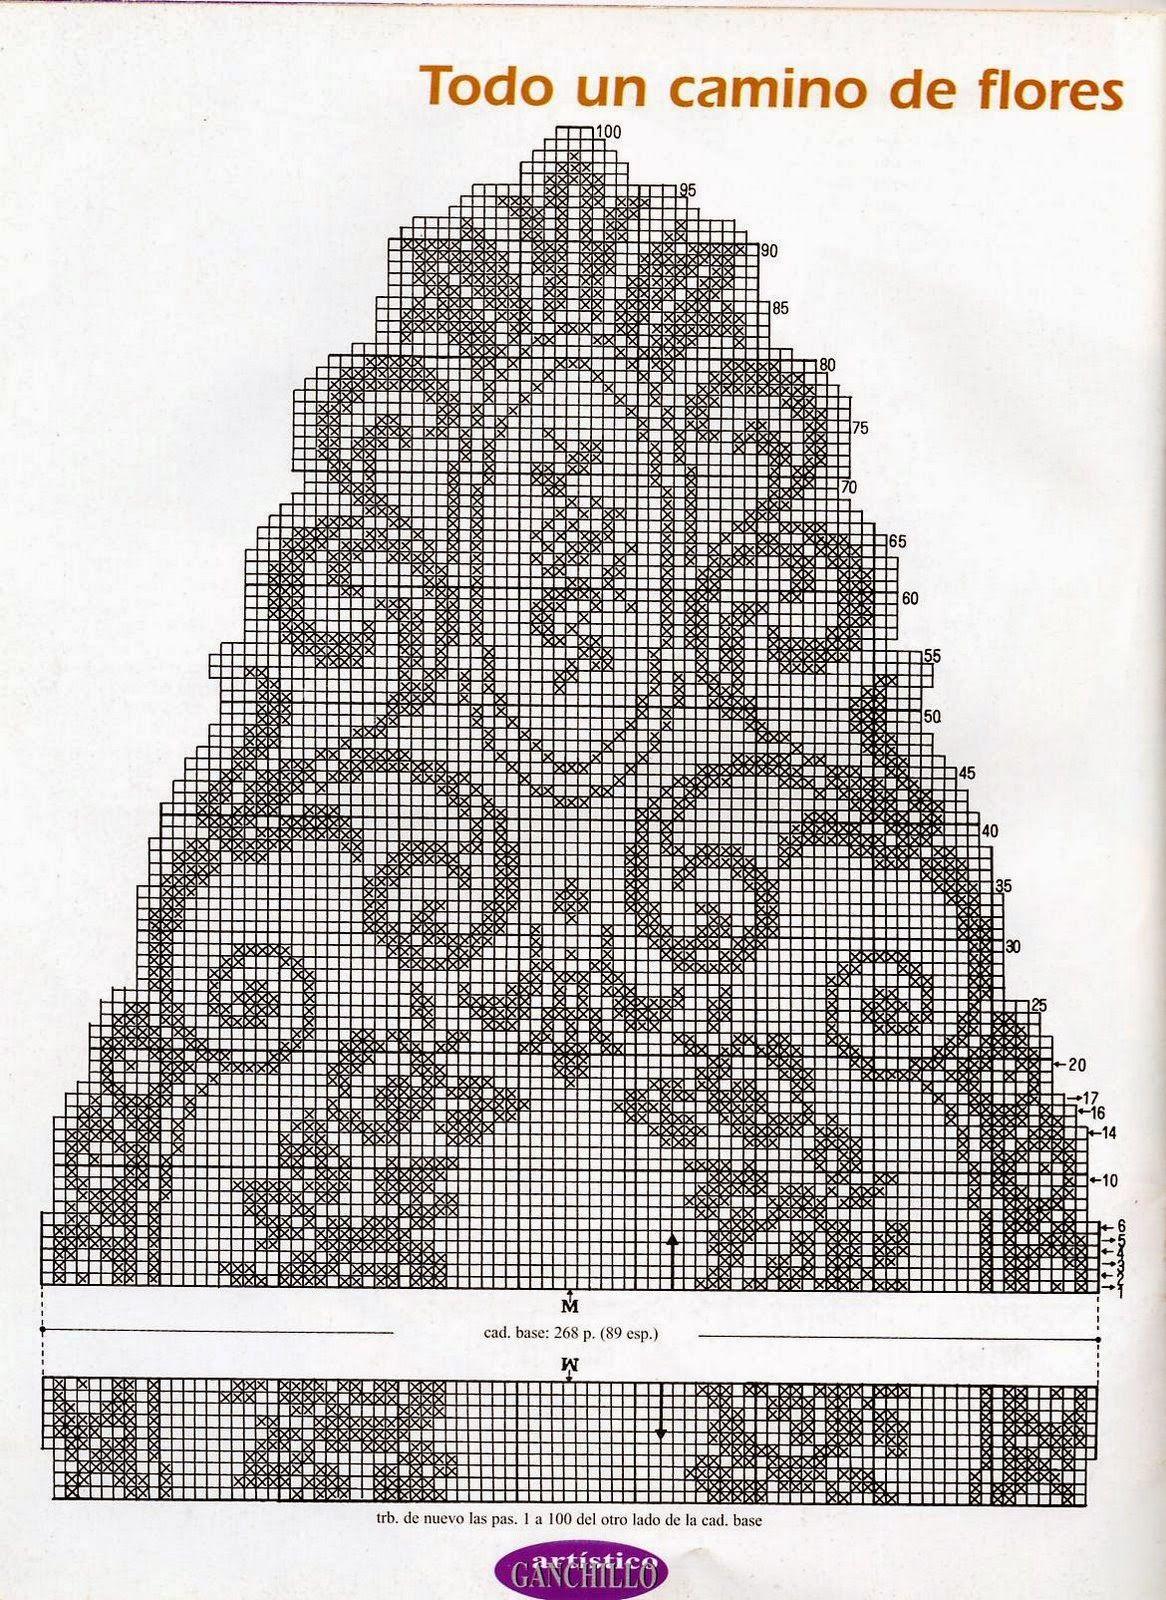 Kira Crochet Scheme No 183 Filet Oval Doilies Doily Diagram Pinterest